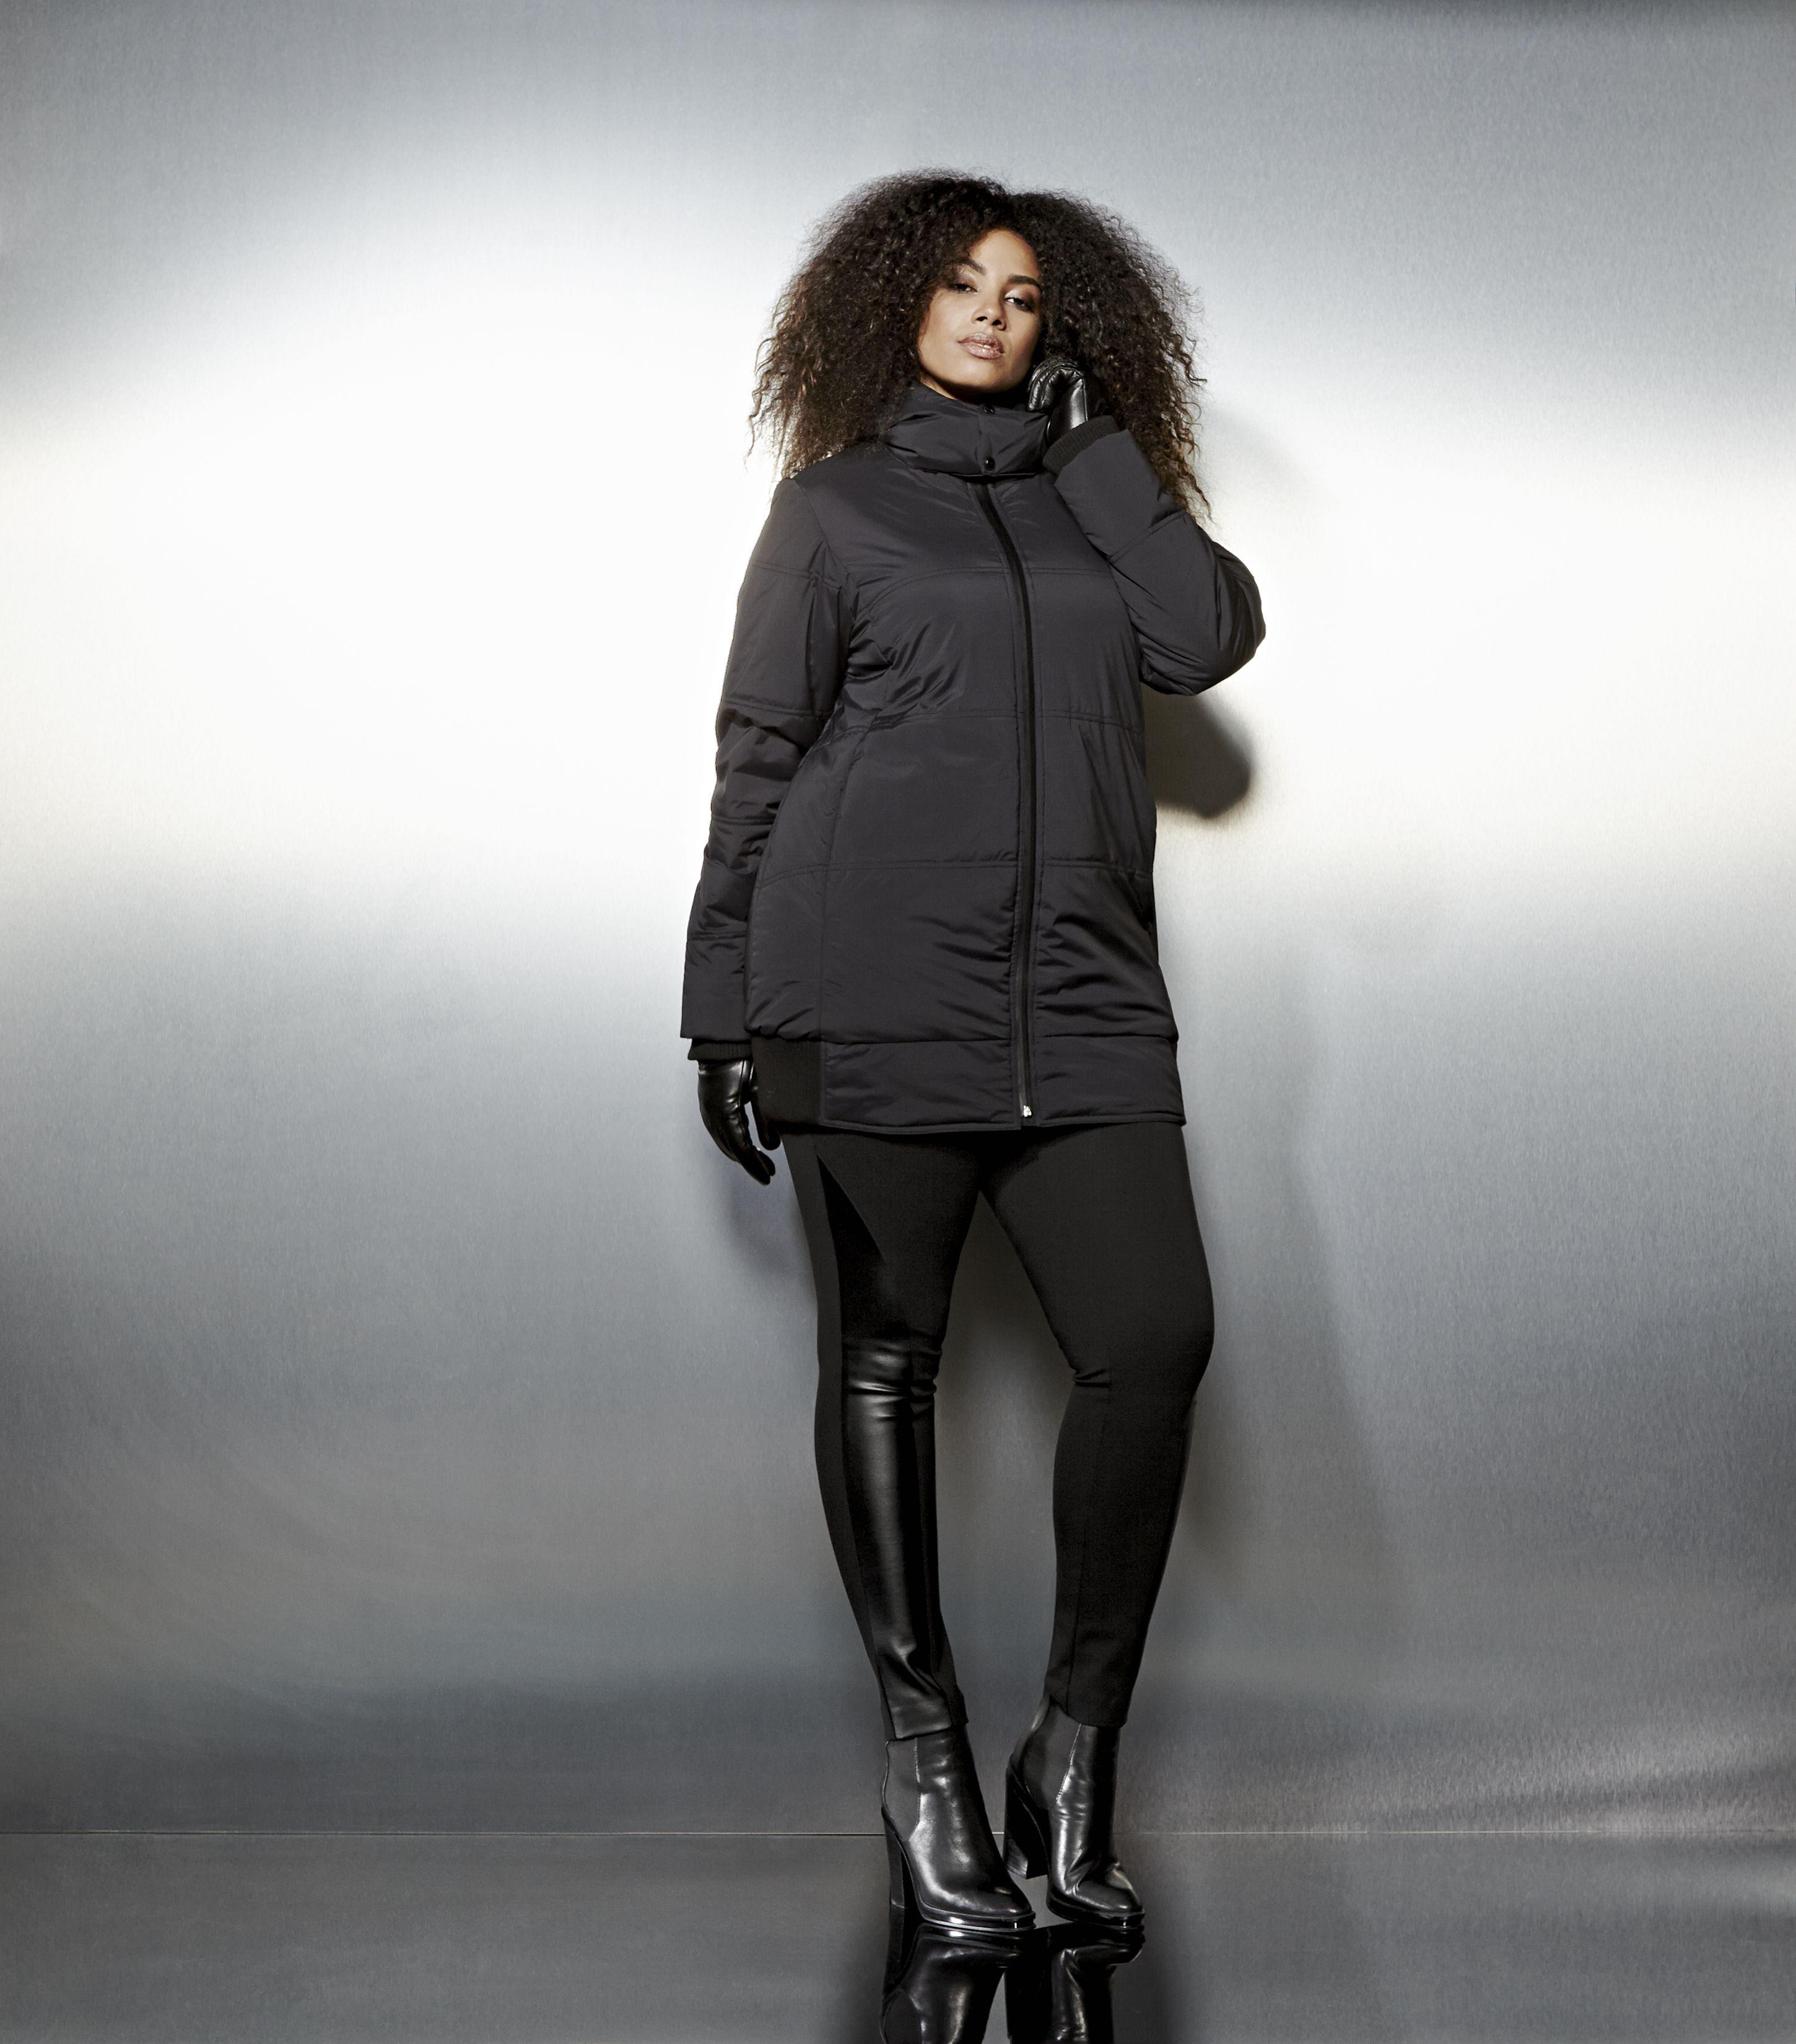 Livik Loose Puffer Jacket Plus Size Coats Plus Size Outfits Coats Jackets [ 3300 x 2900 Pixel ]